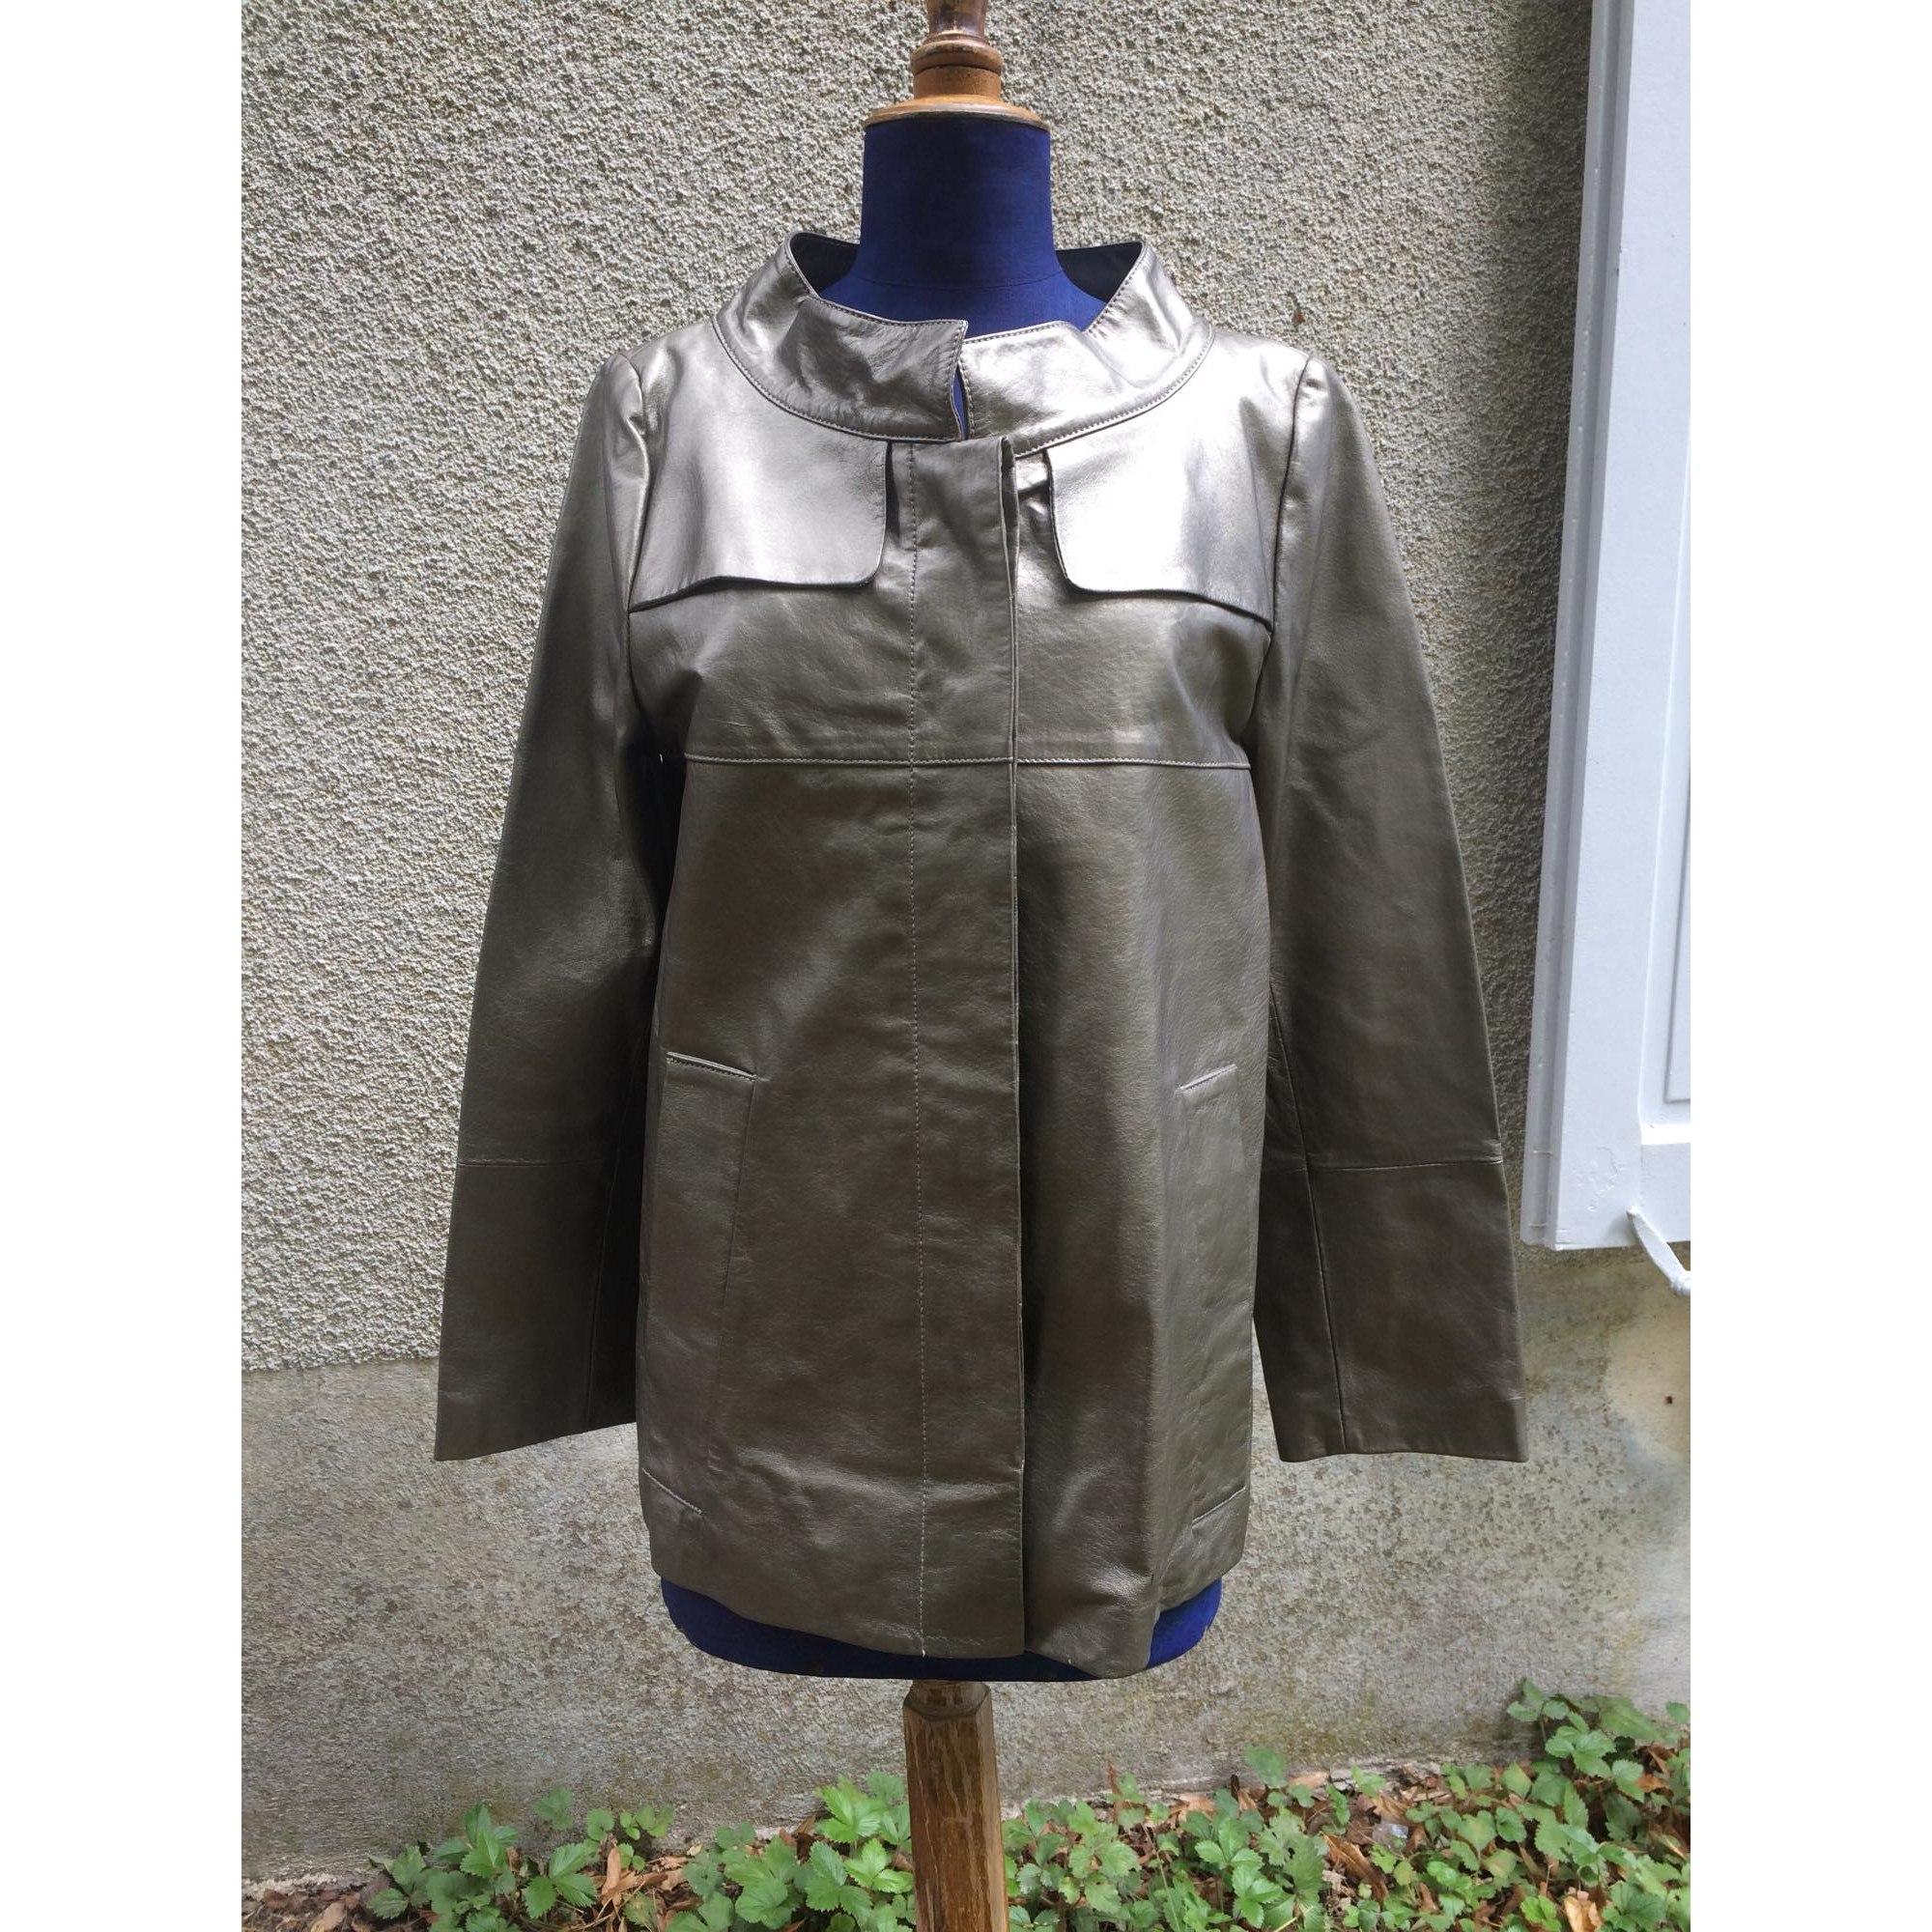 Veste en cuir KOOKAI Doré, bronze, cuivre